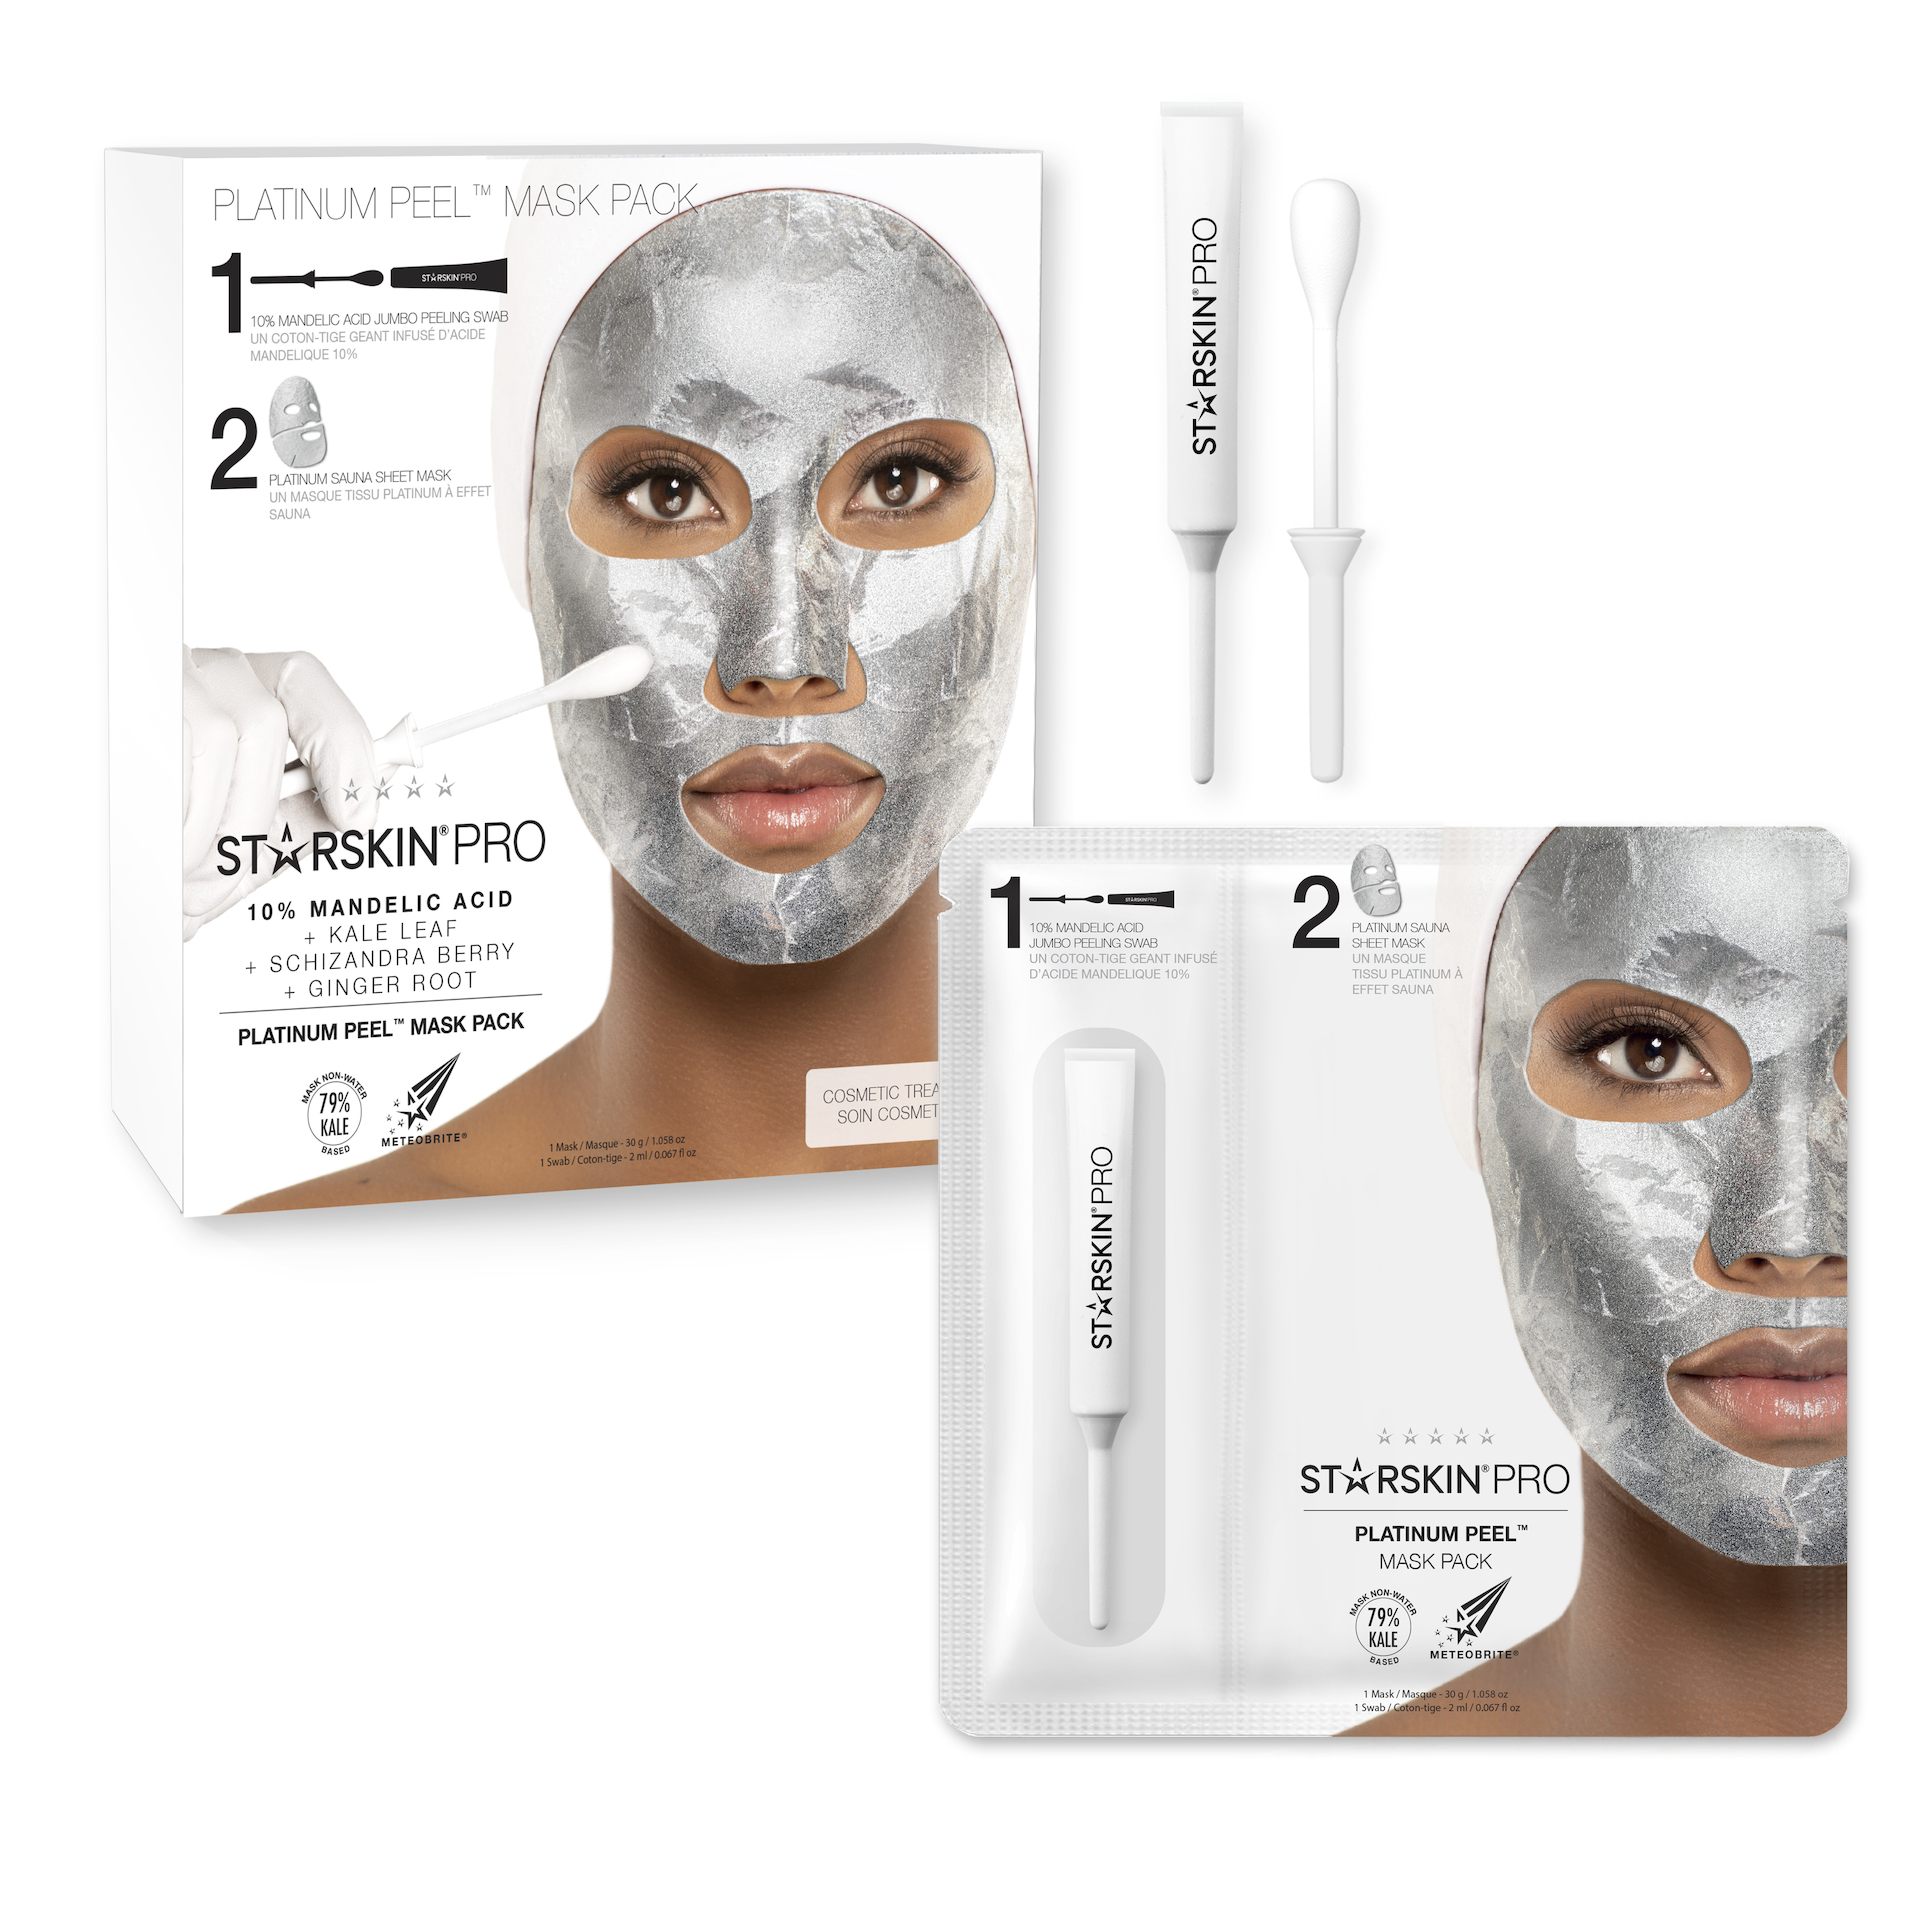 STARSKIN PRO® Platinum Peel™ Mask Pack